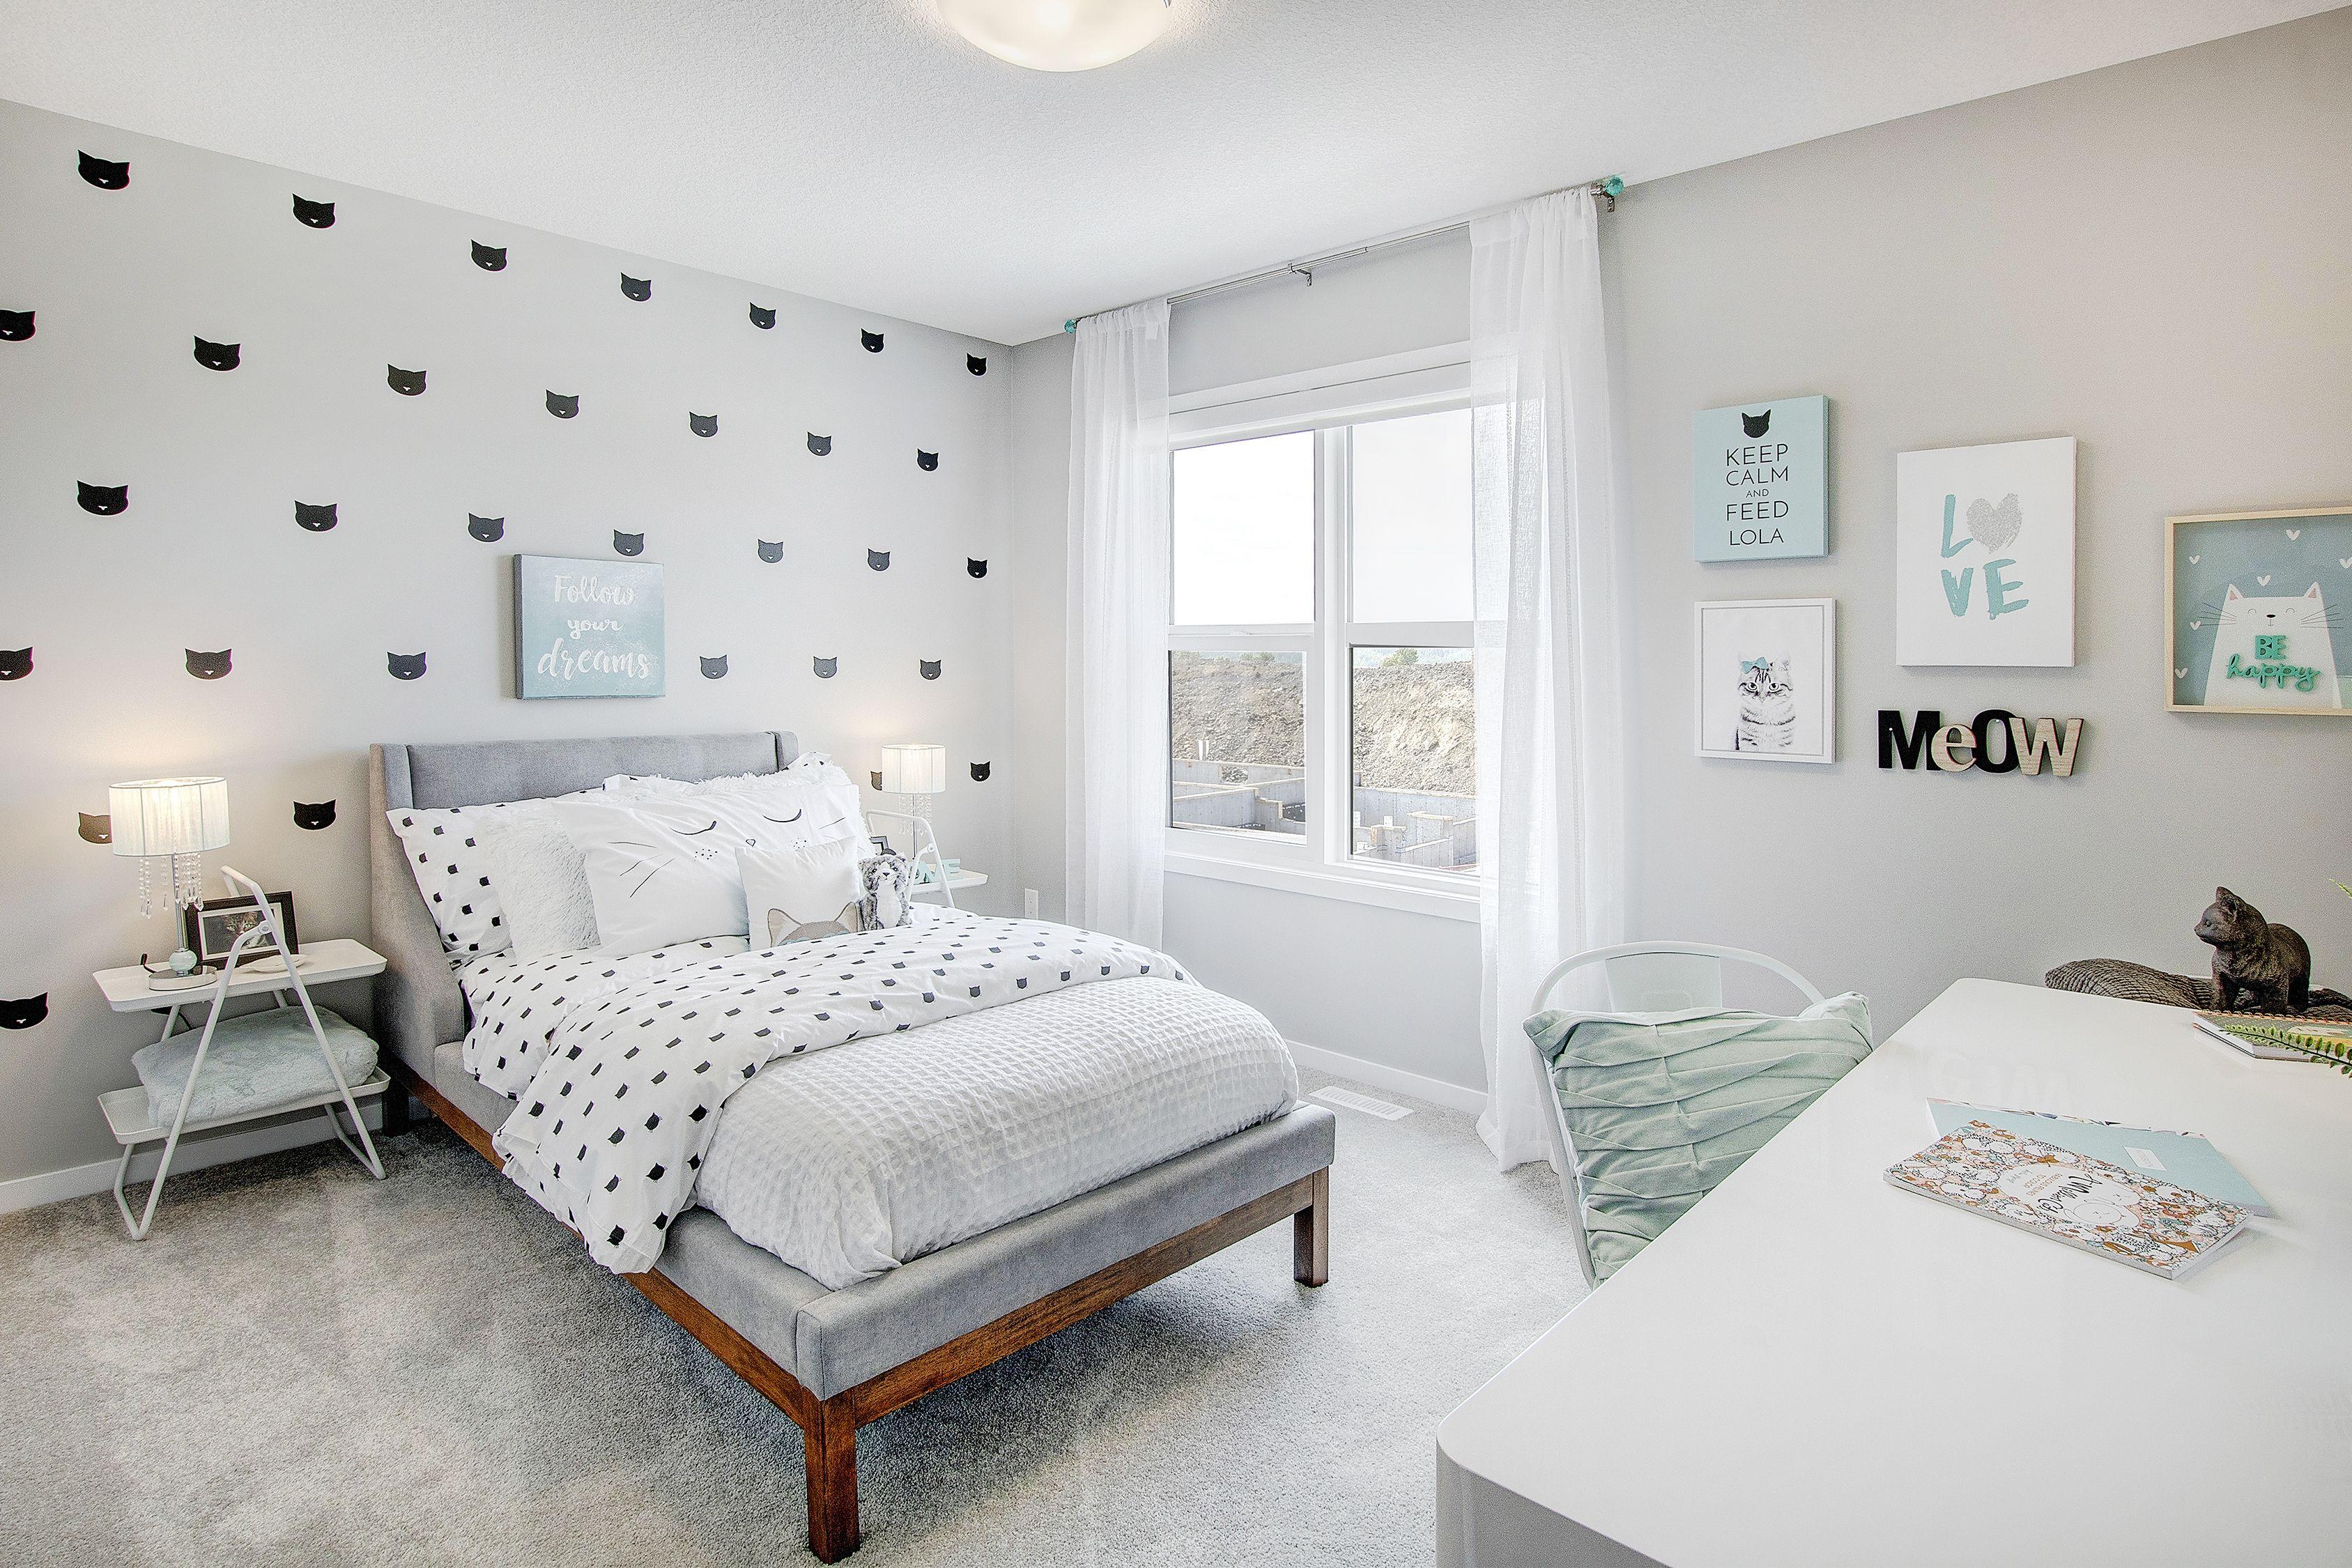 Cat Themed Bedroom Bedroom Themes Cat Bedroom Cat Themed Bedroom